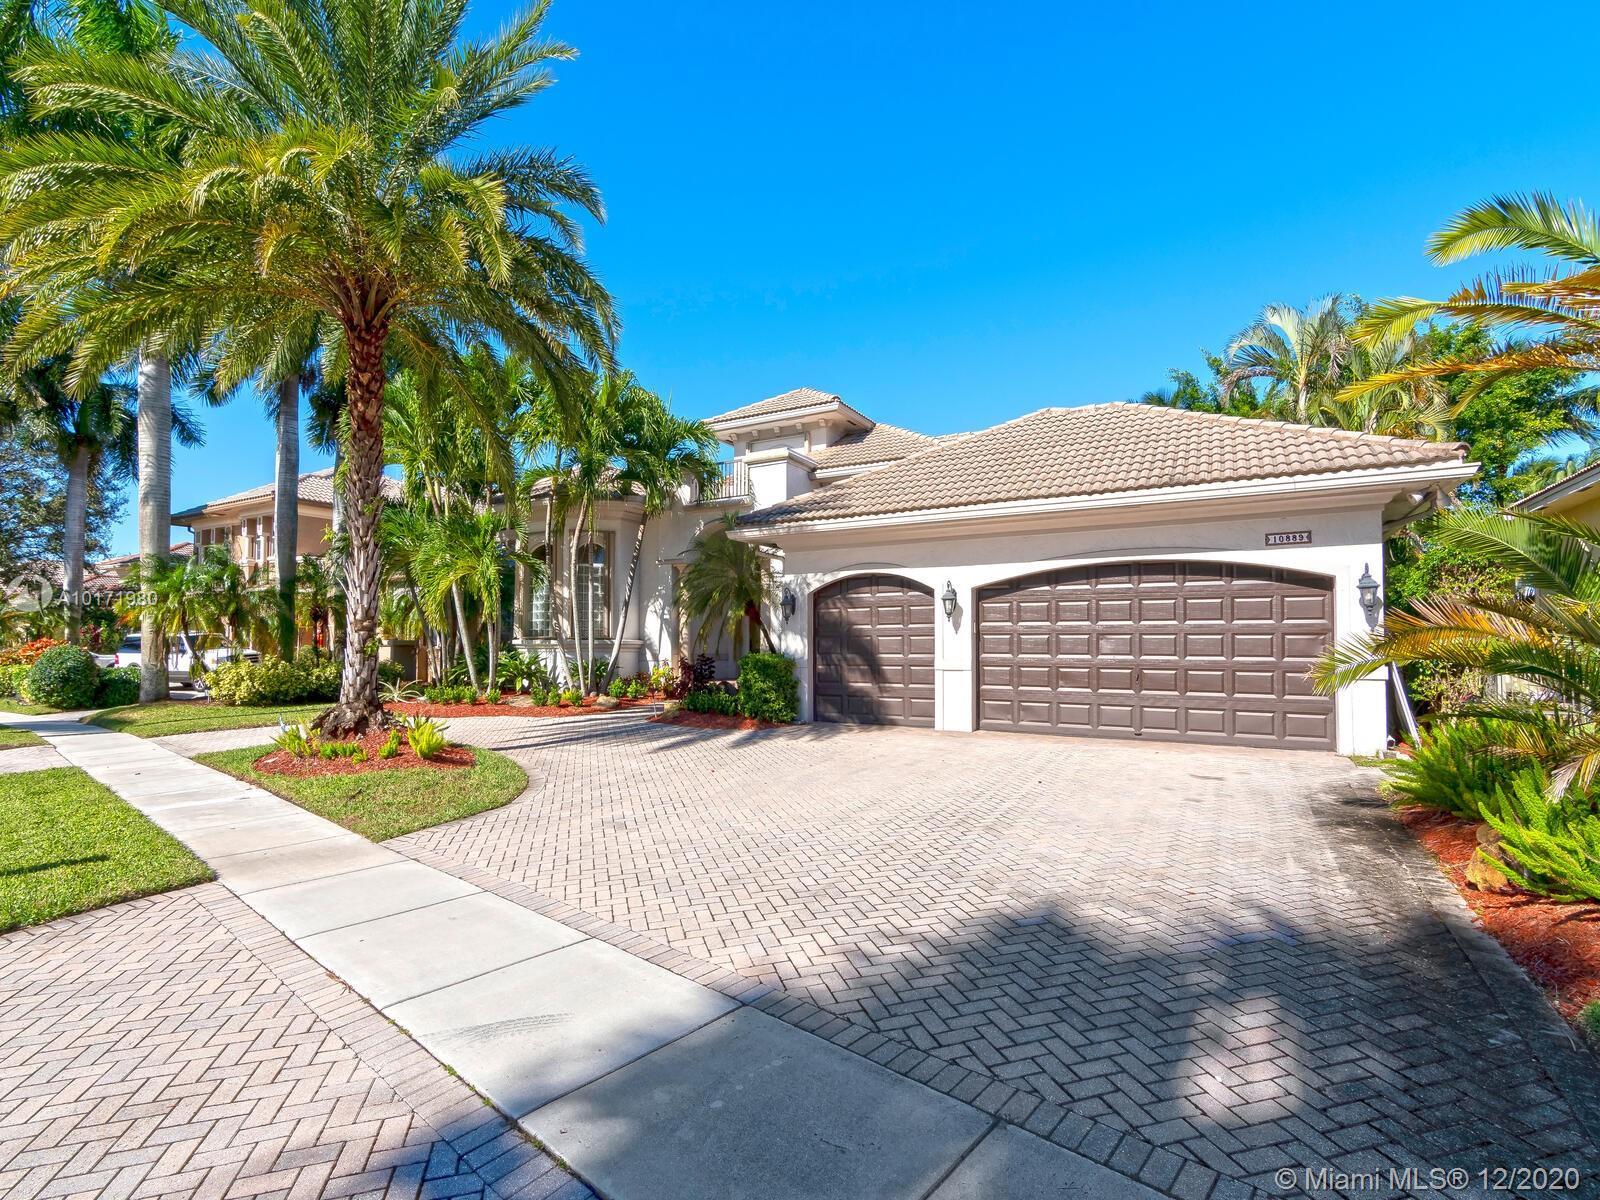 10889 Blue Palm St, Plantation, FL 33324